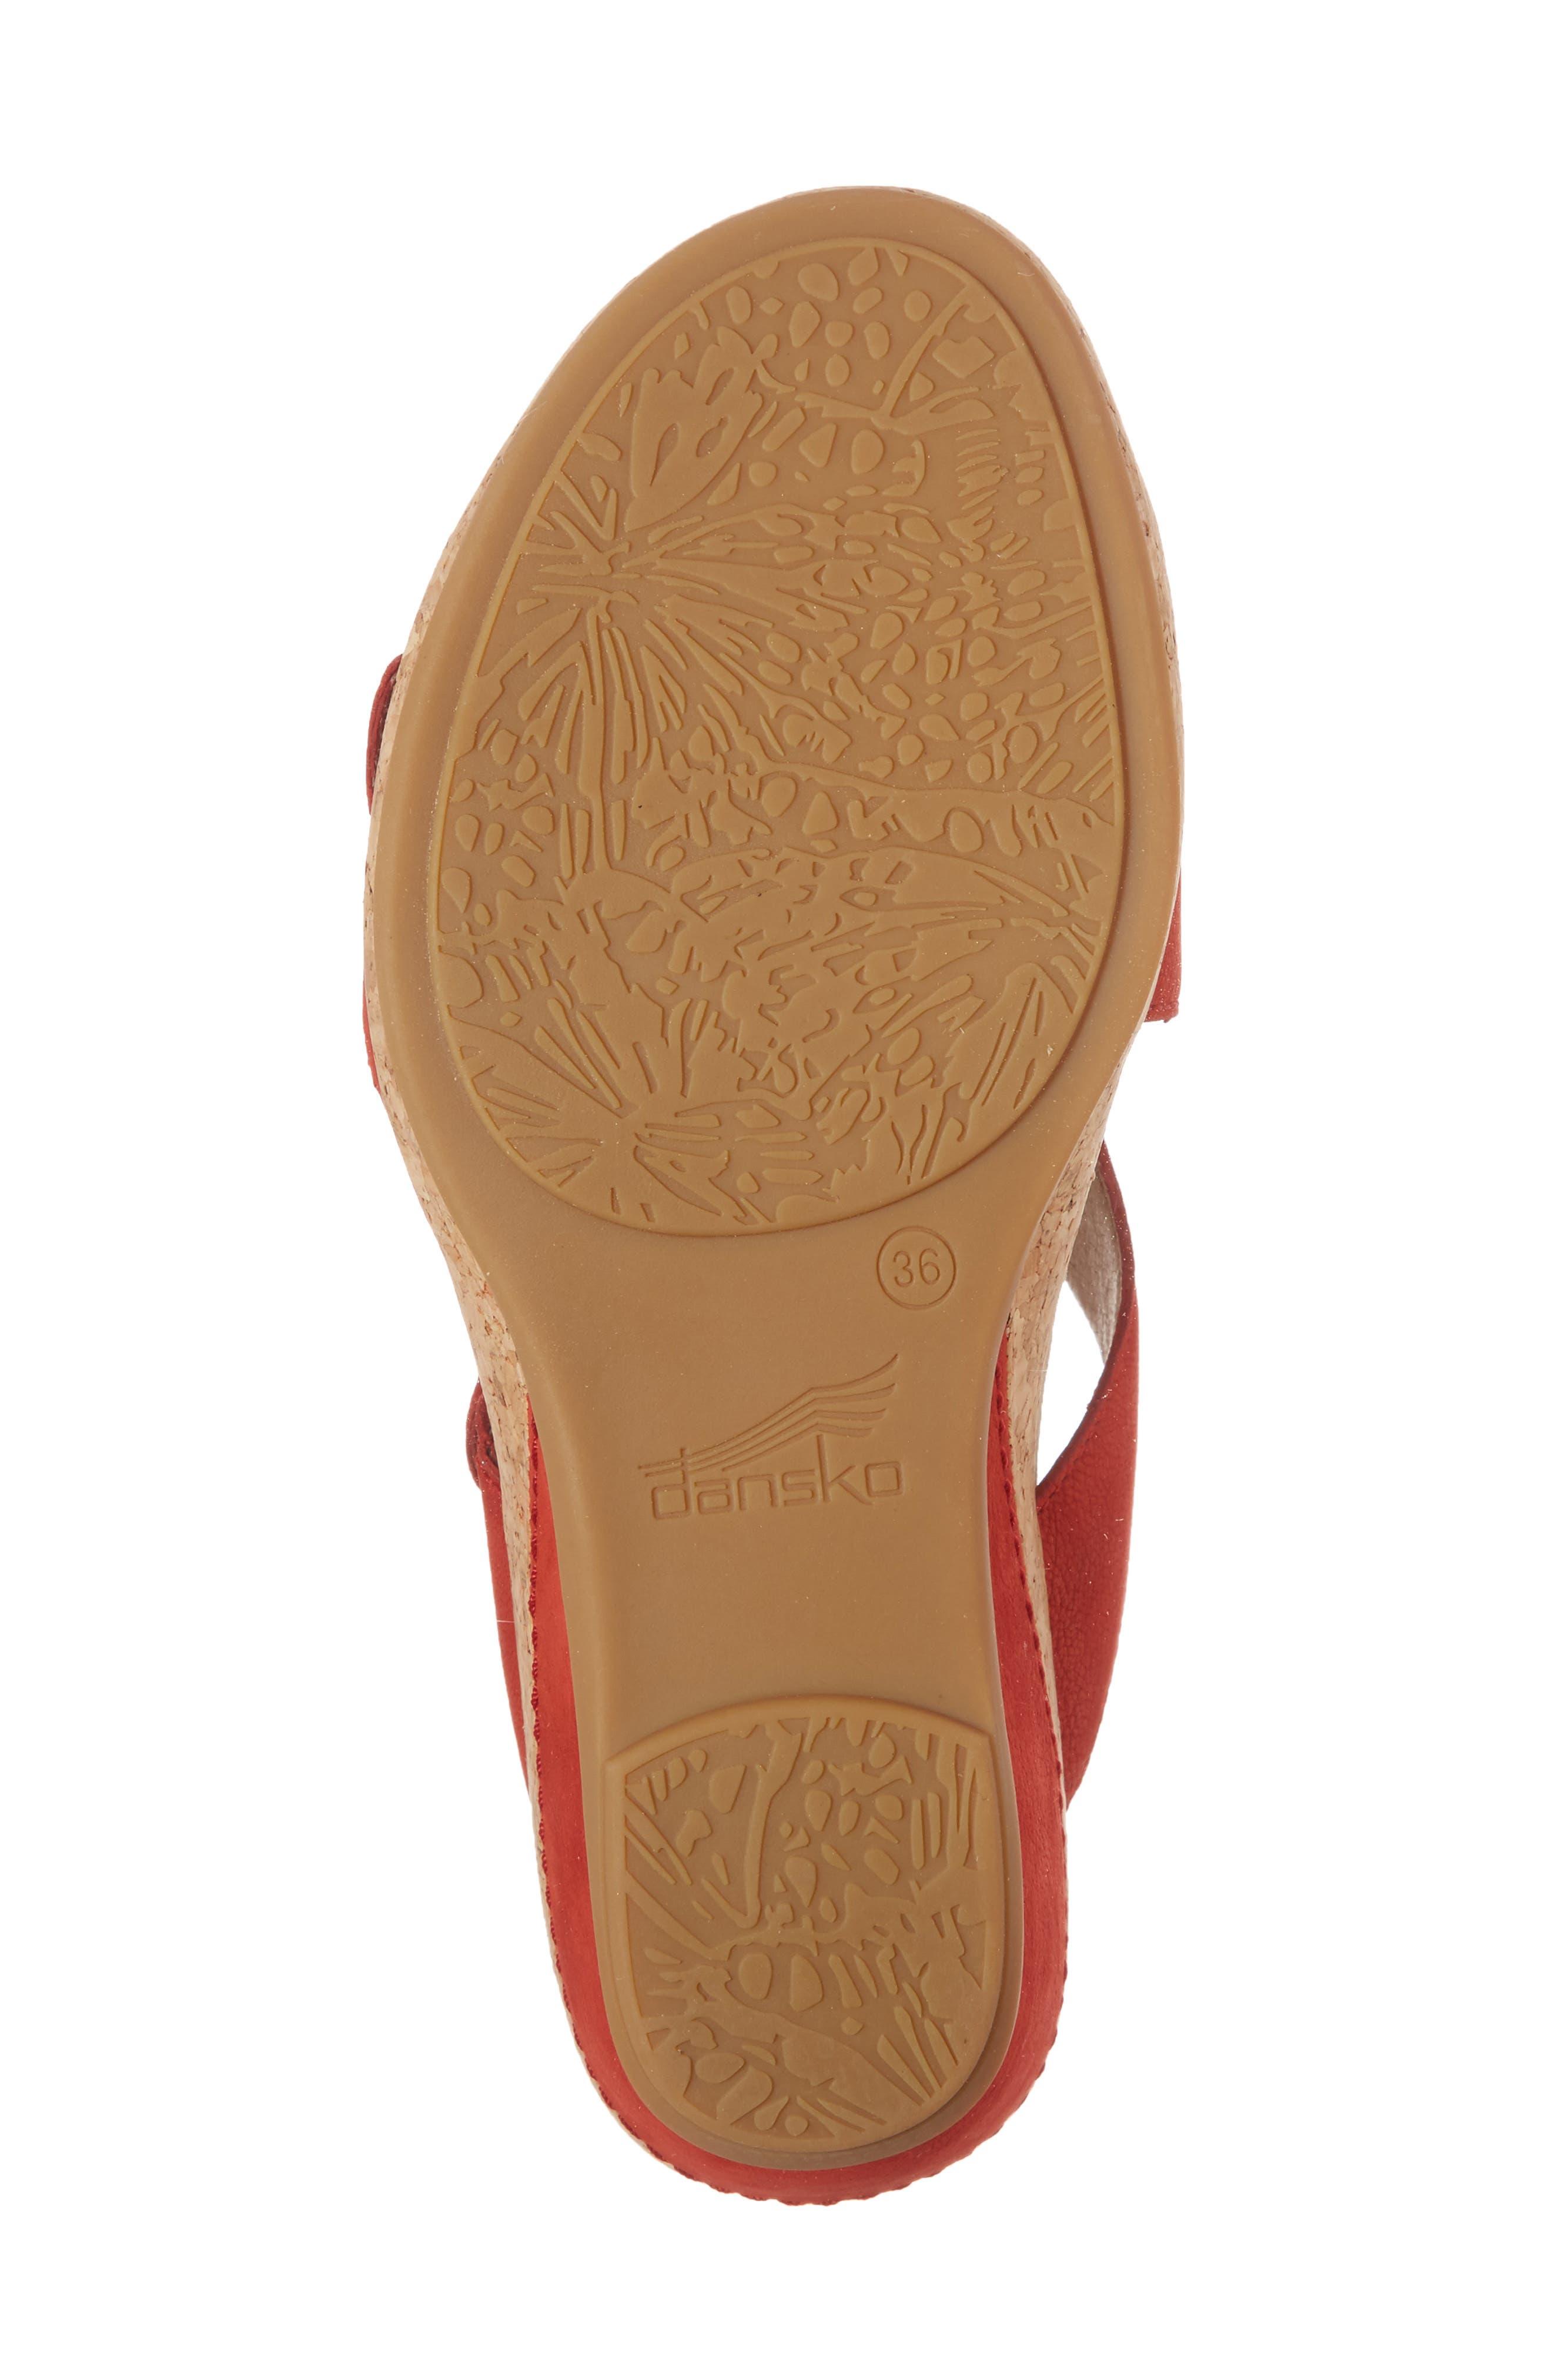 Carla Wedge Slide Sandal,                             Alternate thumbnail 6, color,                             Tomato Milled Nubuck Leather